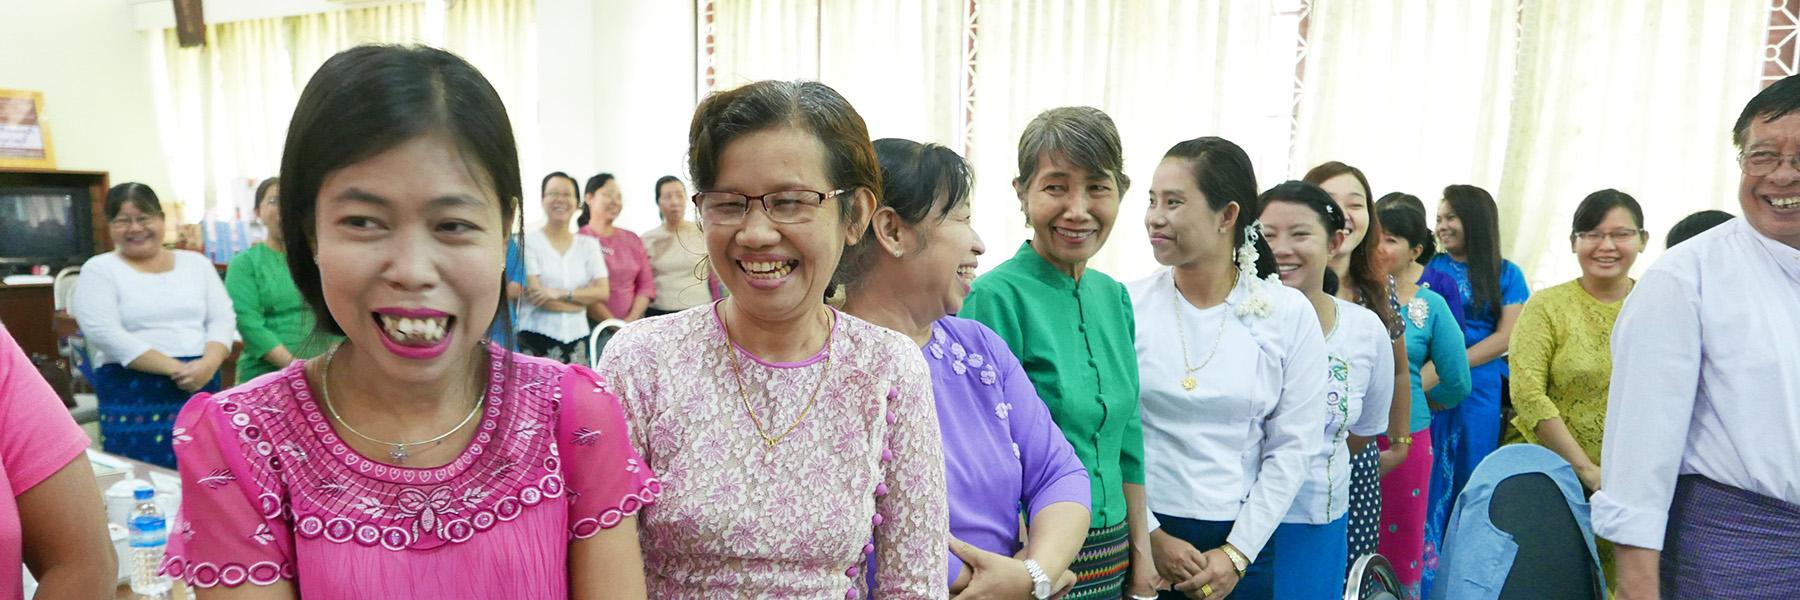 SILL Participants In Yangon, Myanmar